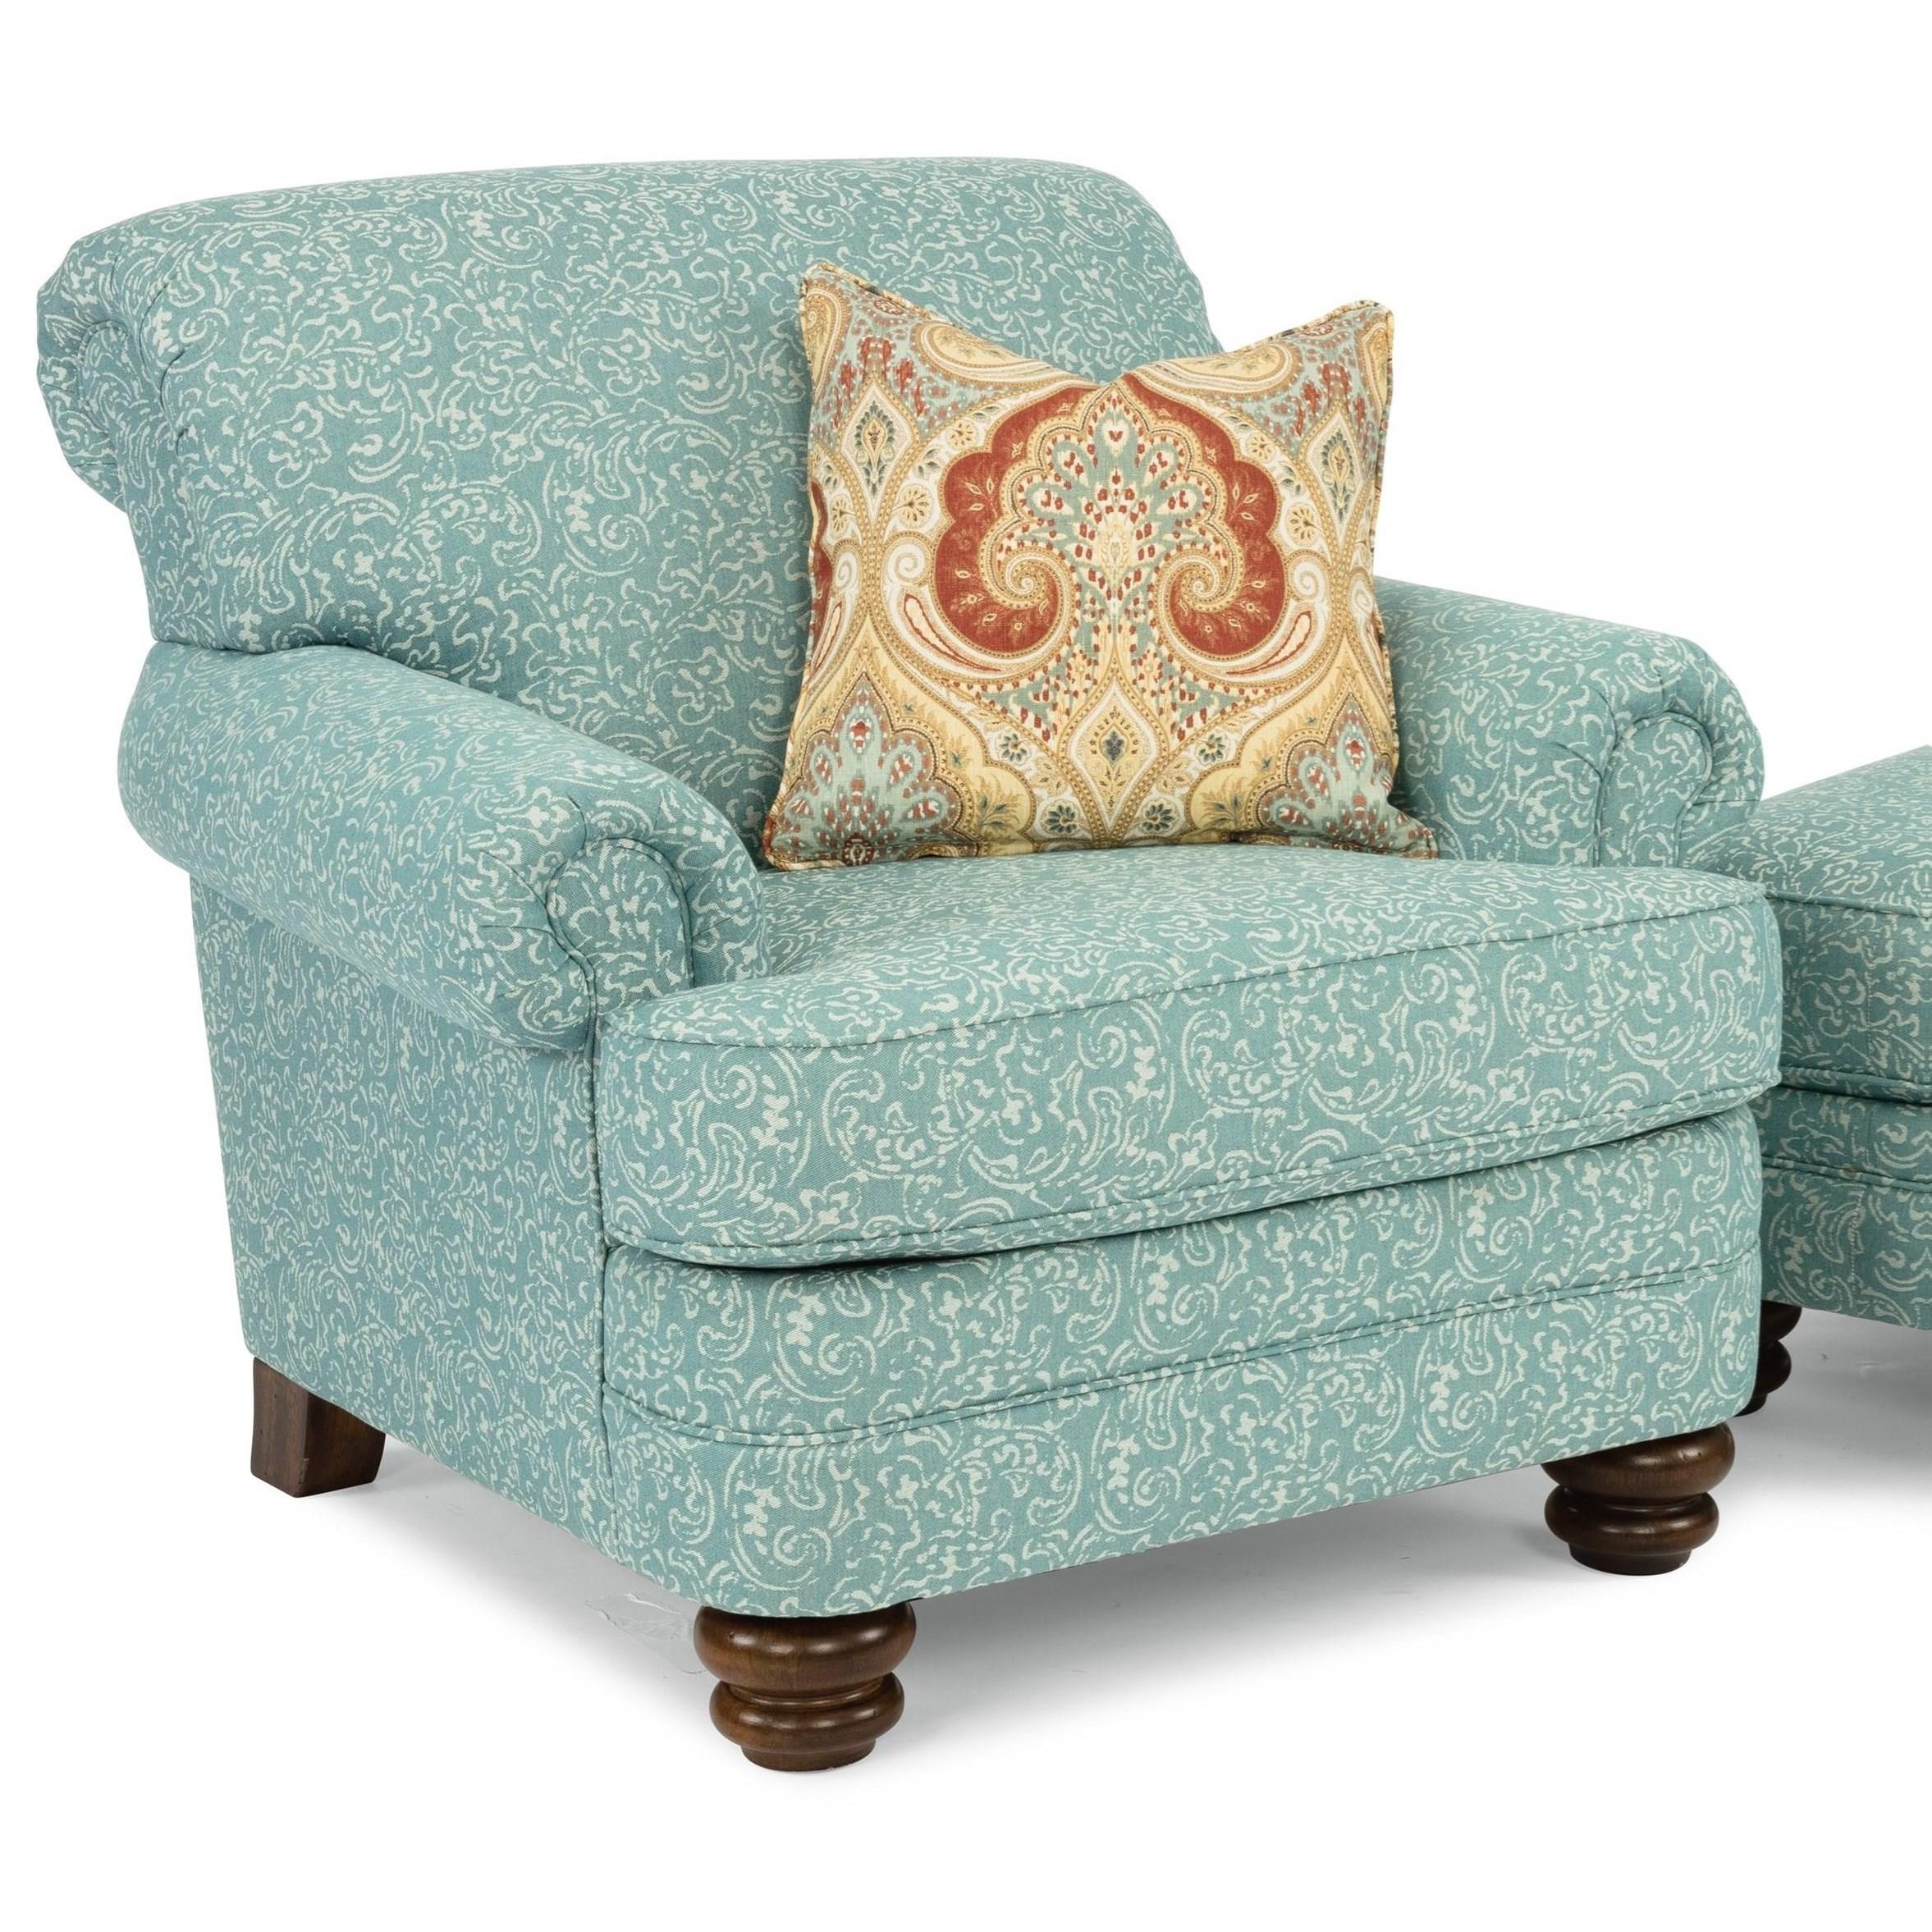 Bay Bridge Traditional Chair by Flexsteel at Jordan's Home Furnishings